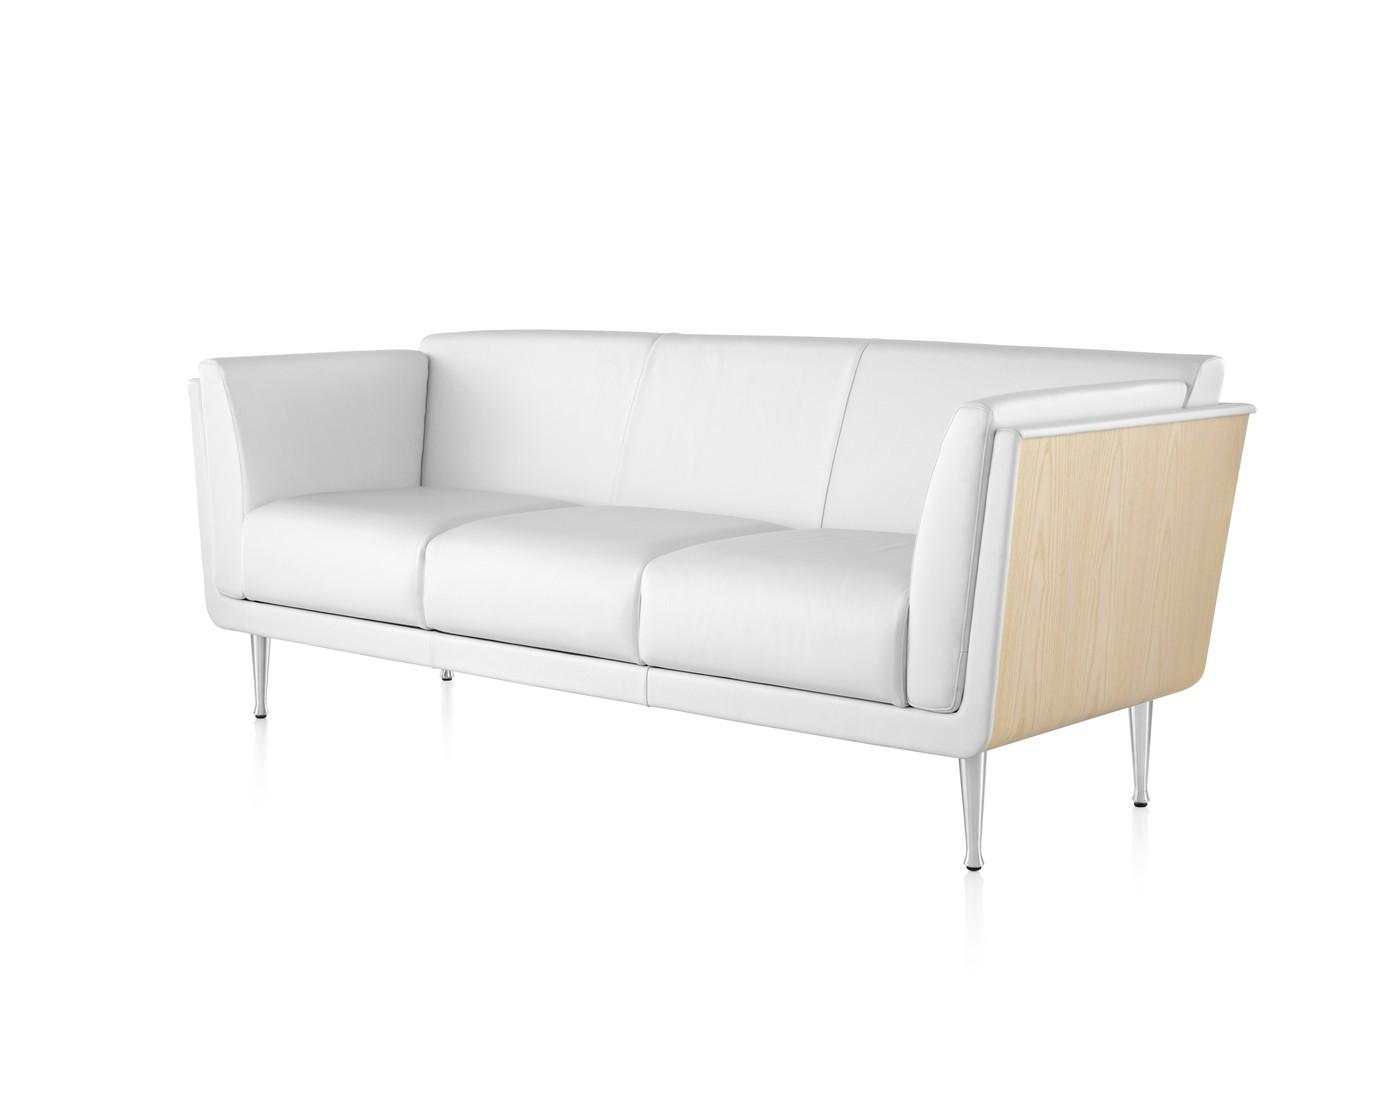 4-Silla-Lounge-Sofa-Goetz-Beauty-1380